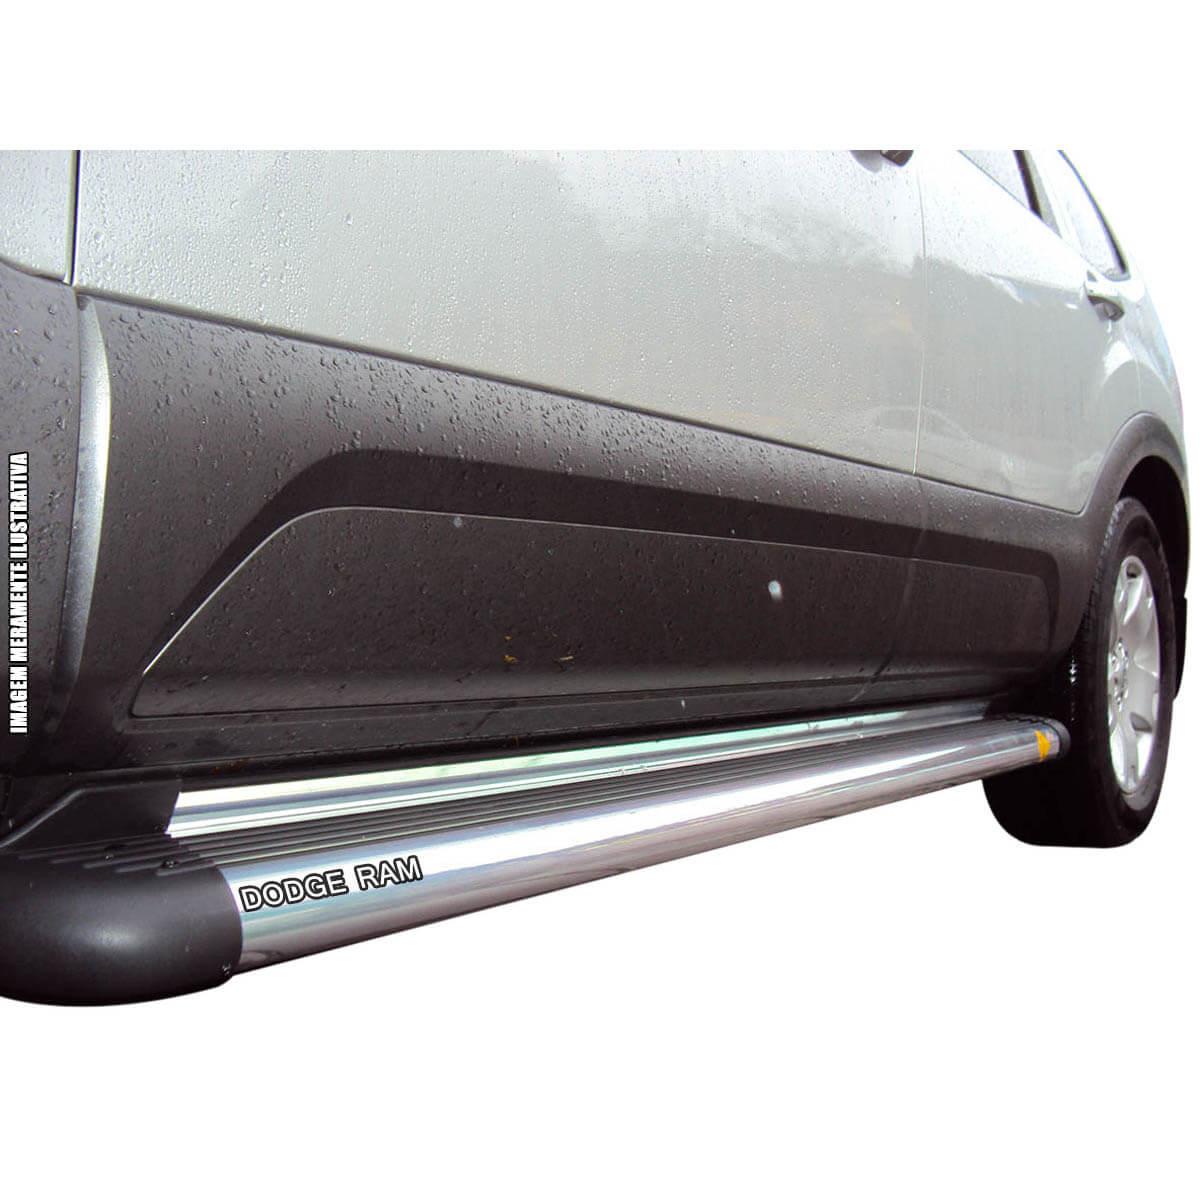 Estribo plataforma alumínio Dodge Ram cabine dupla 2005 a 2011